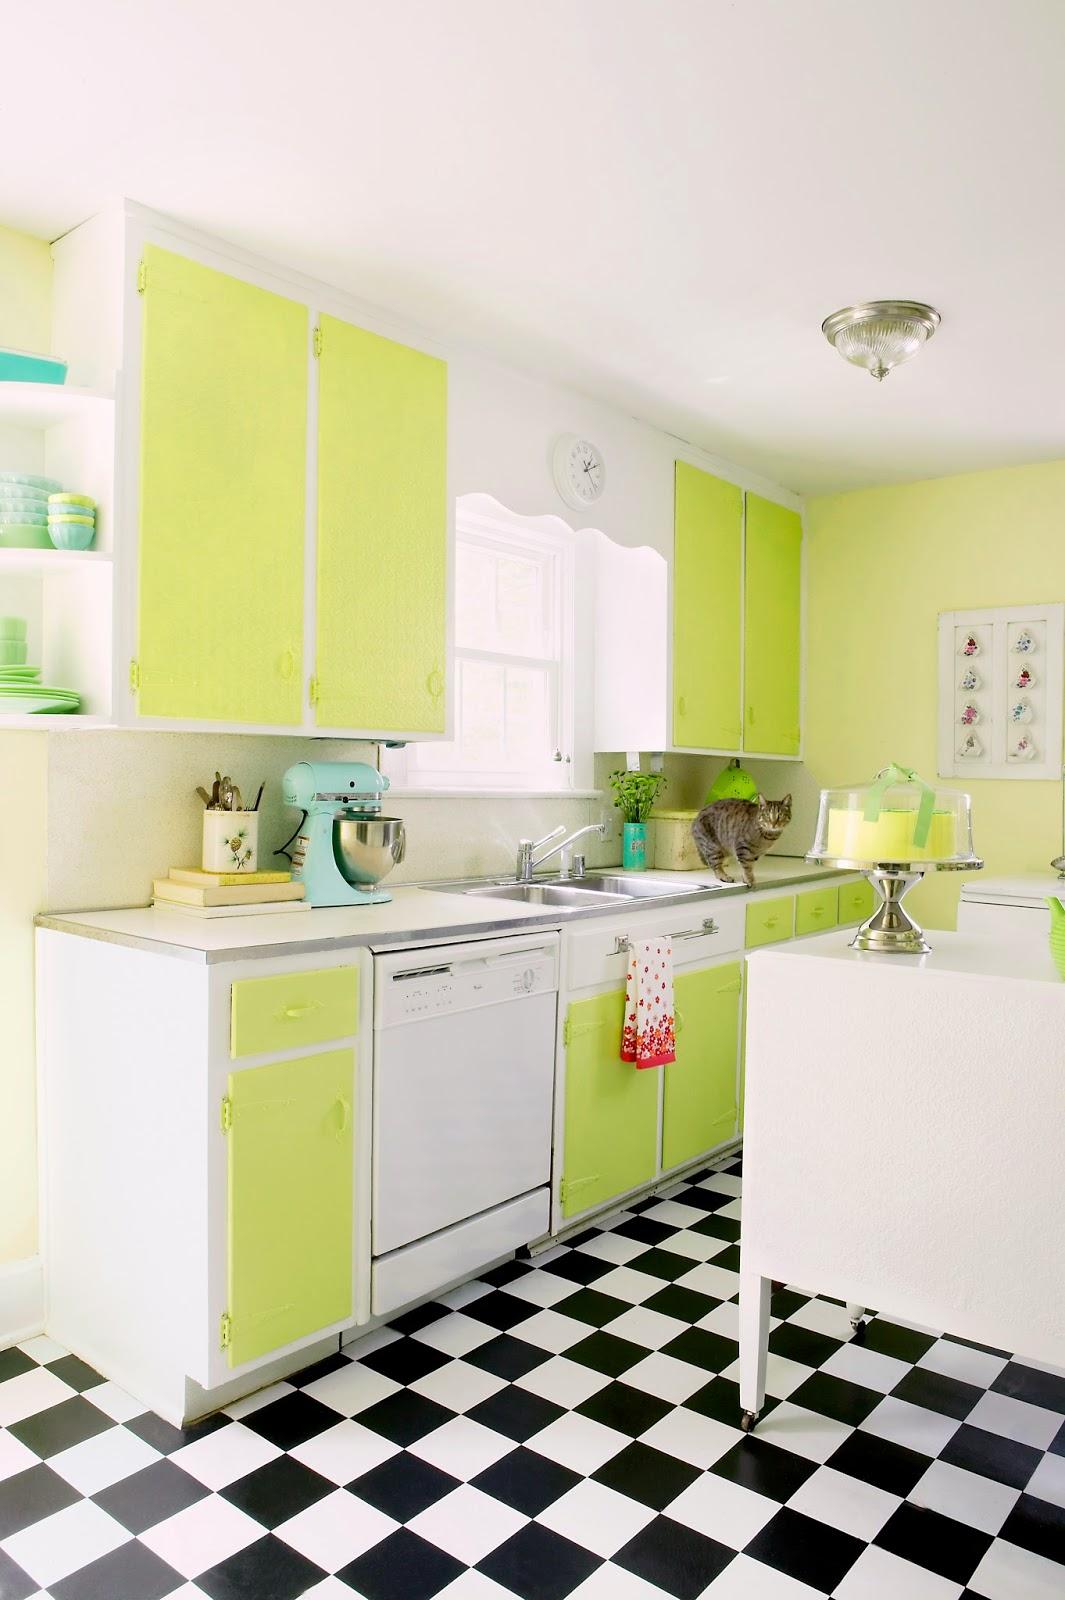 piso-xadrez-na-cozinha-colorida